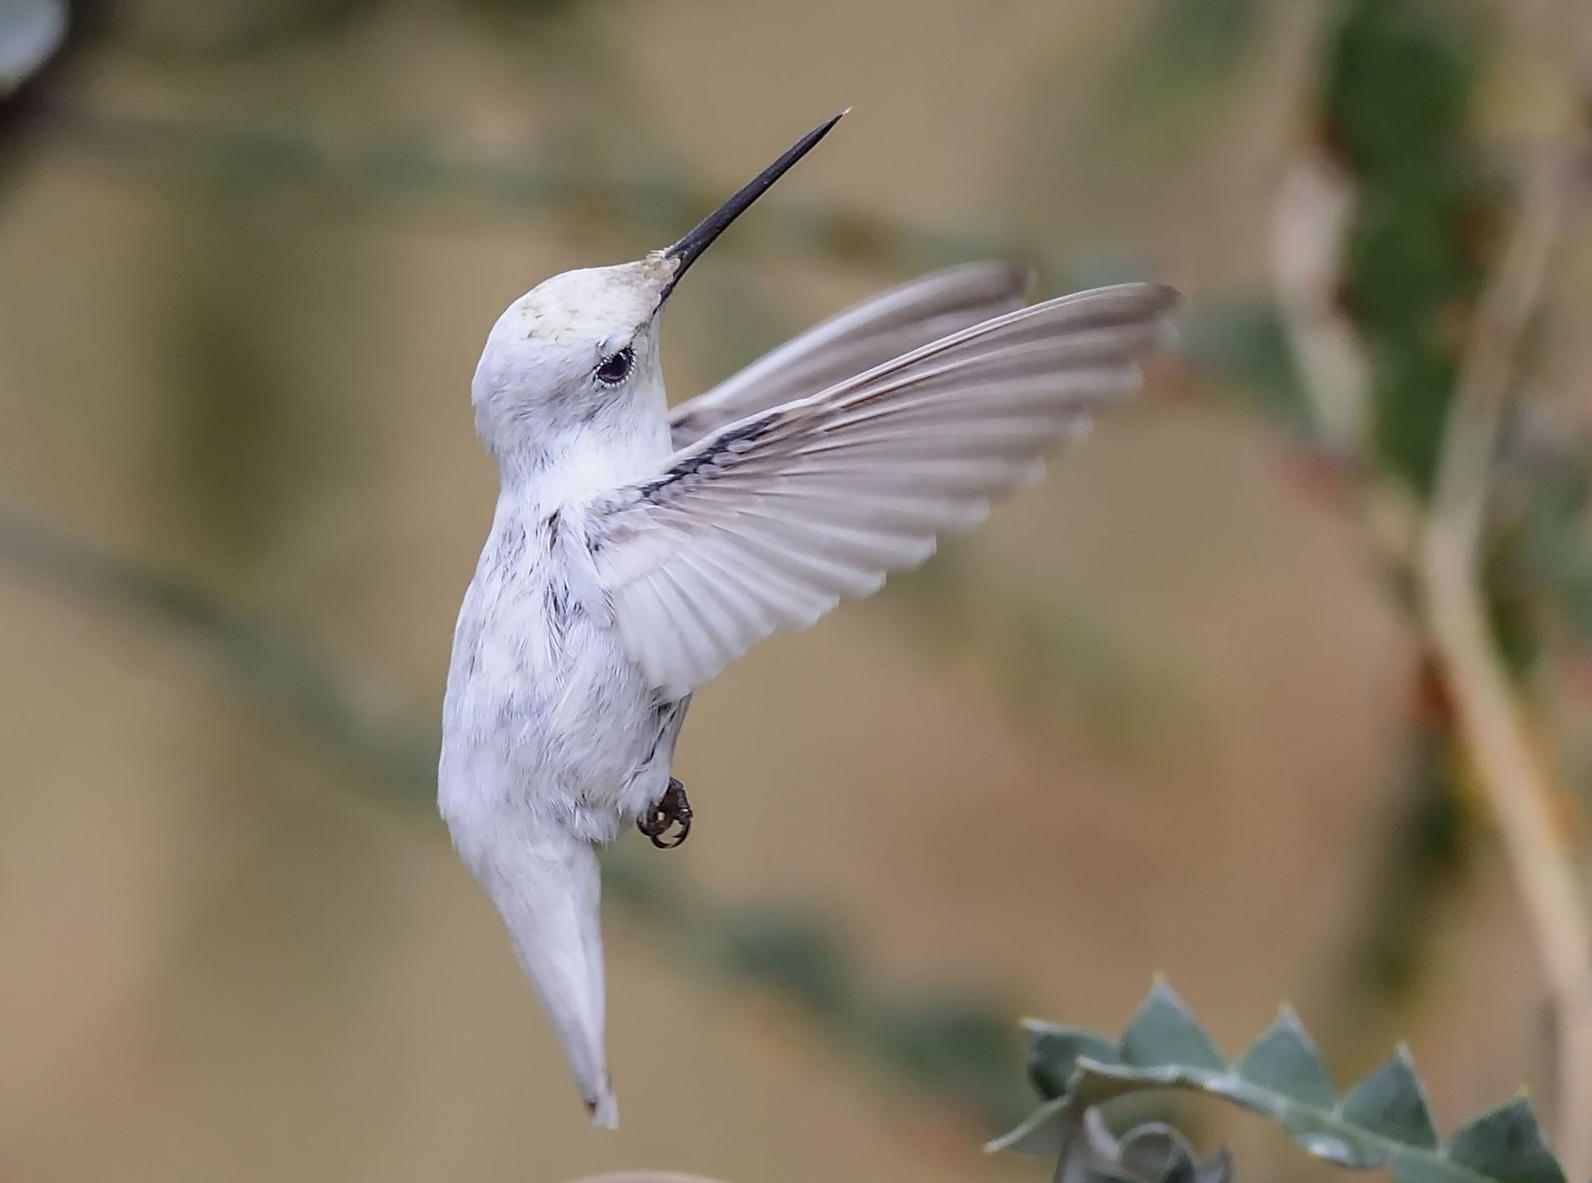 Rare White Hummingbird Steals the Spotlight at California Garden #albinoanimals